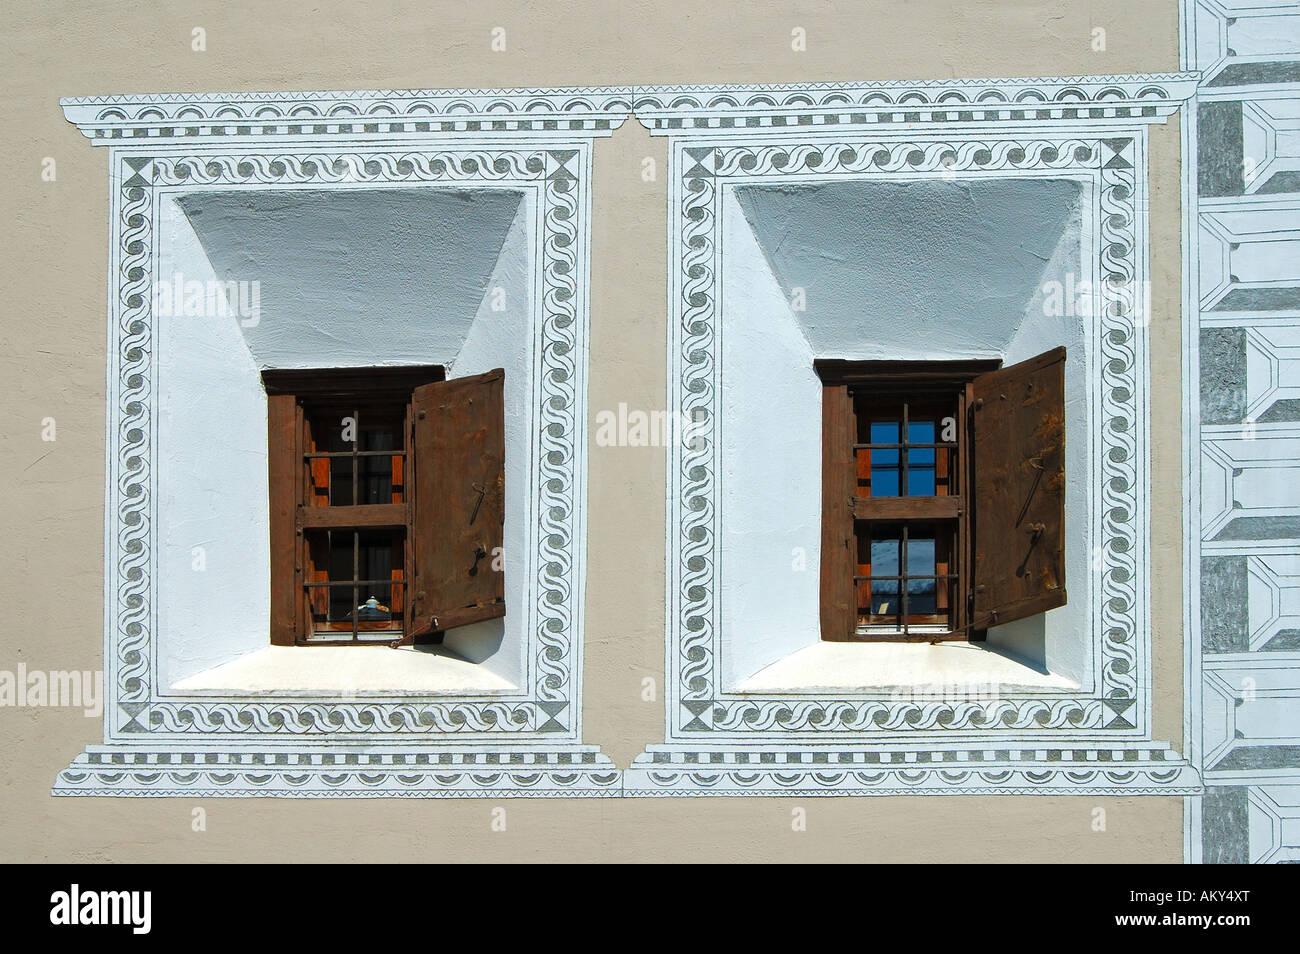 Windows of a typical Engadine house, Engadin, Switzerland Stock Photo